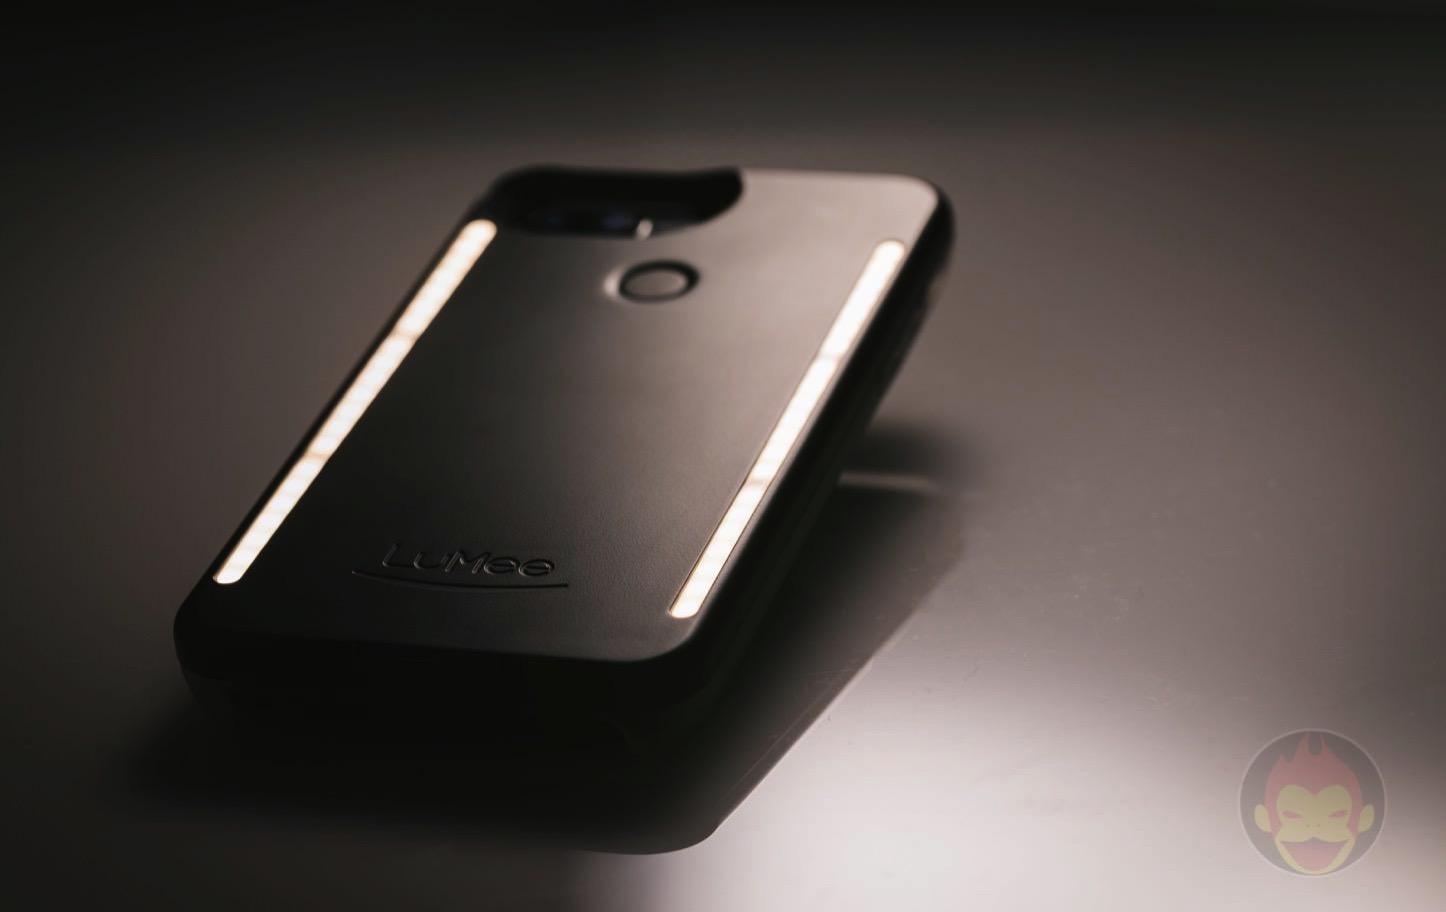 LuMee-Duo-LED-Lighting-Case-03.jpg